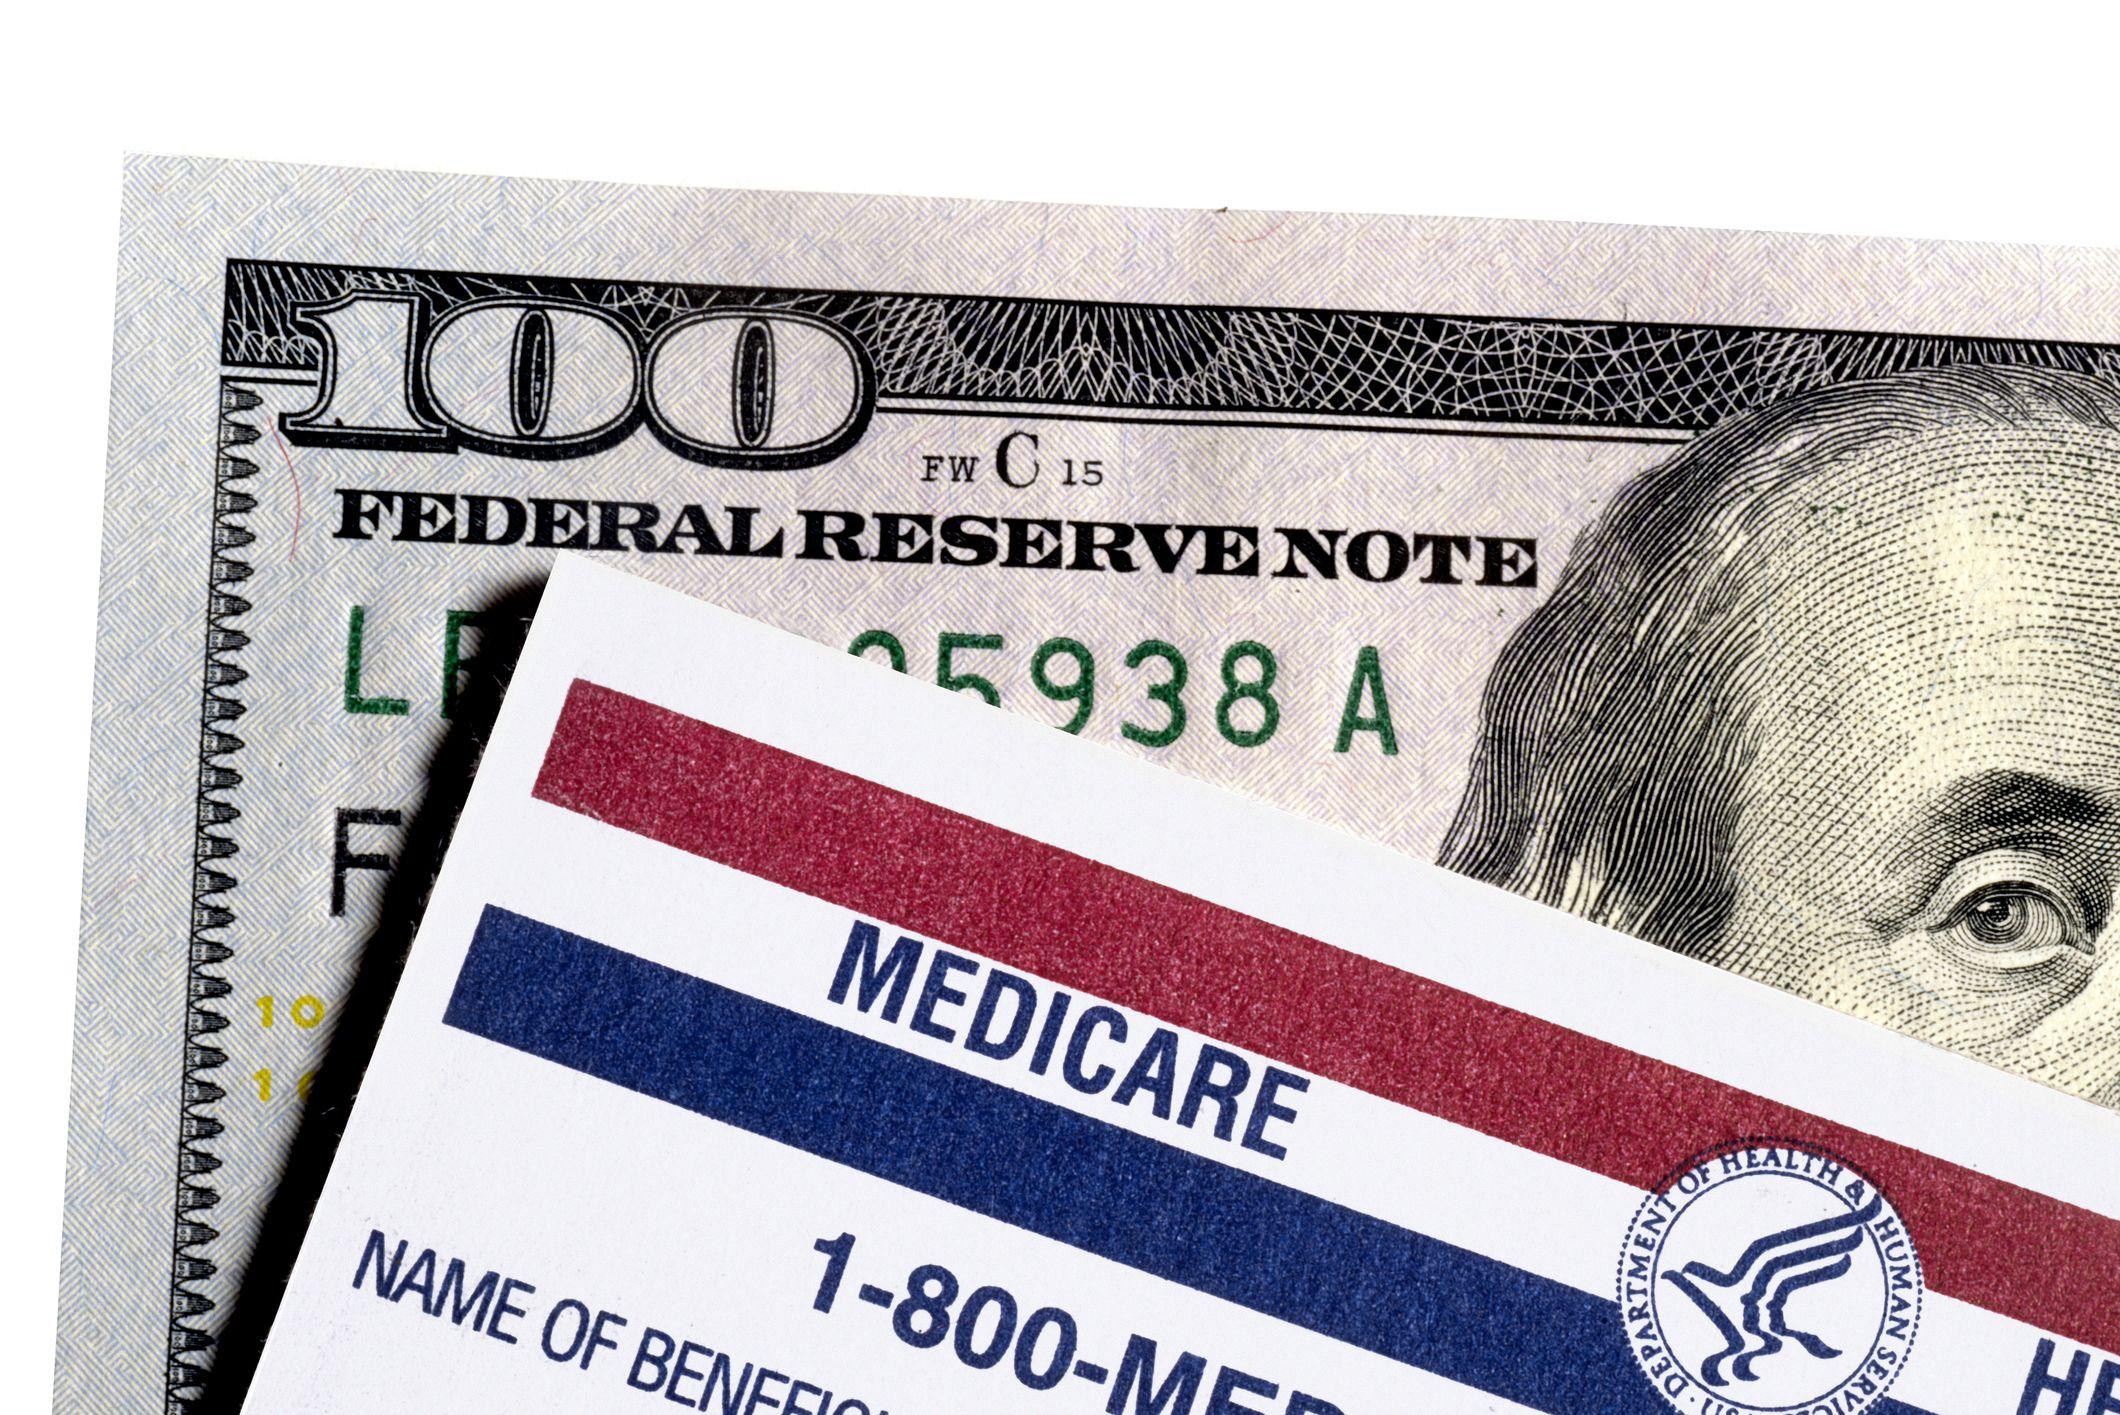 100 dollar bill and medicare form